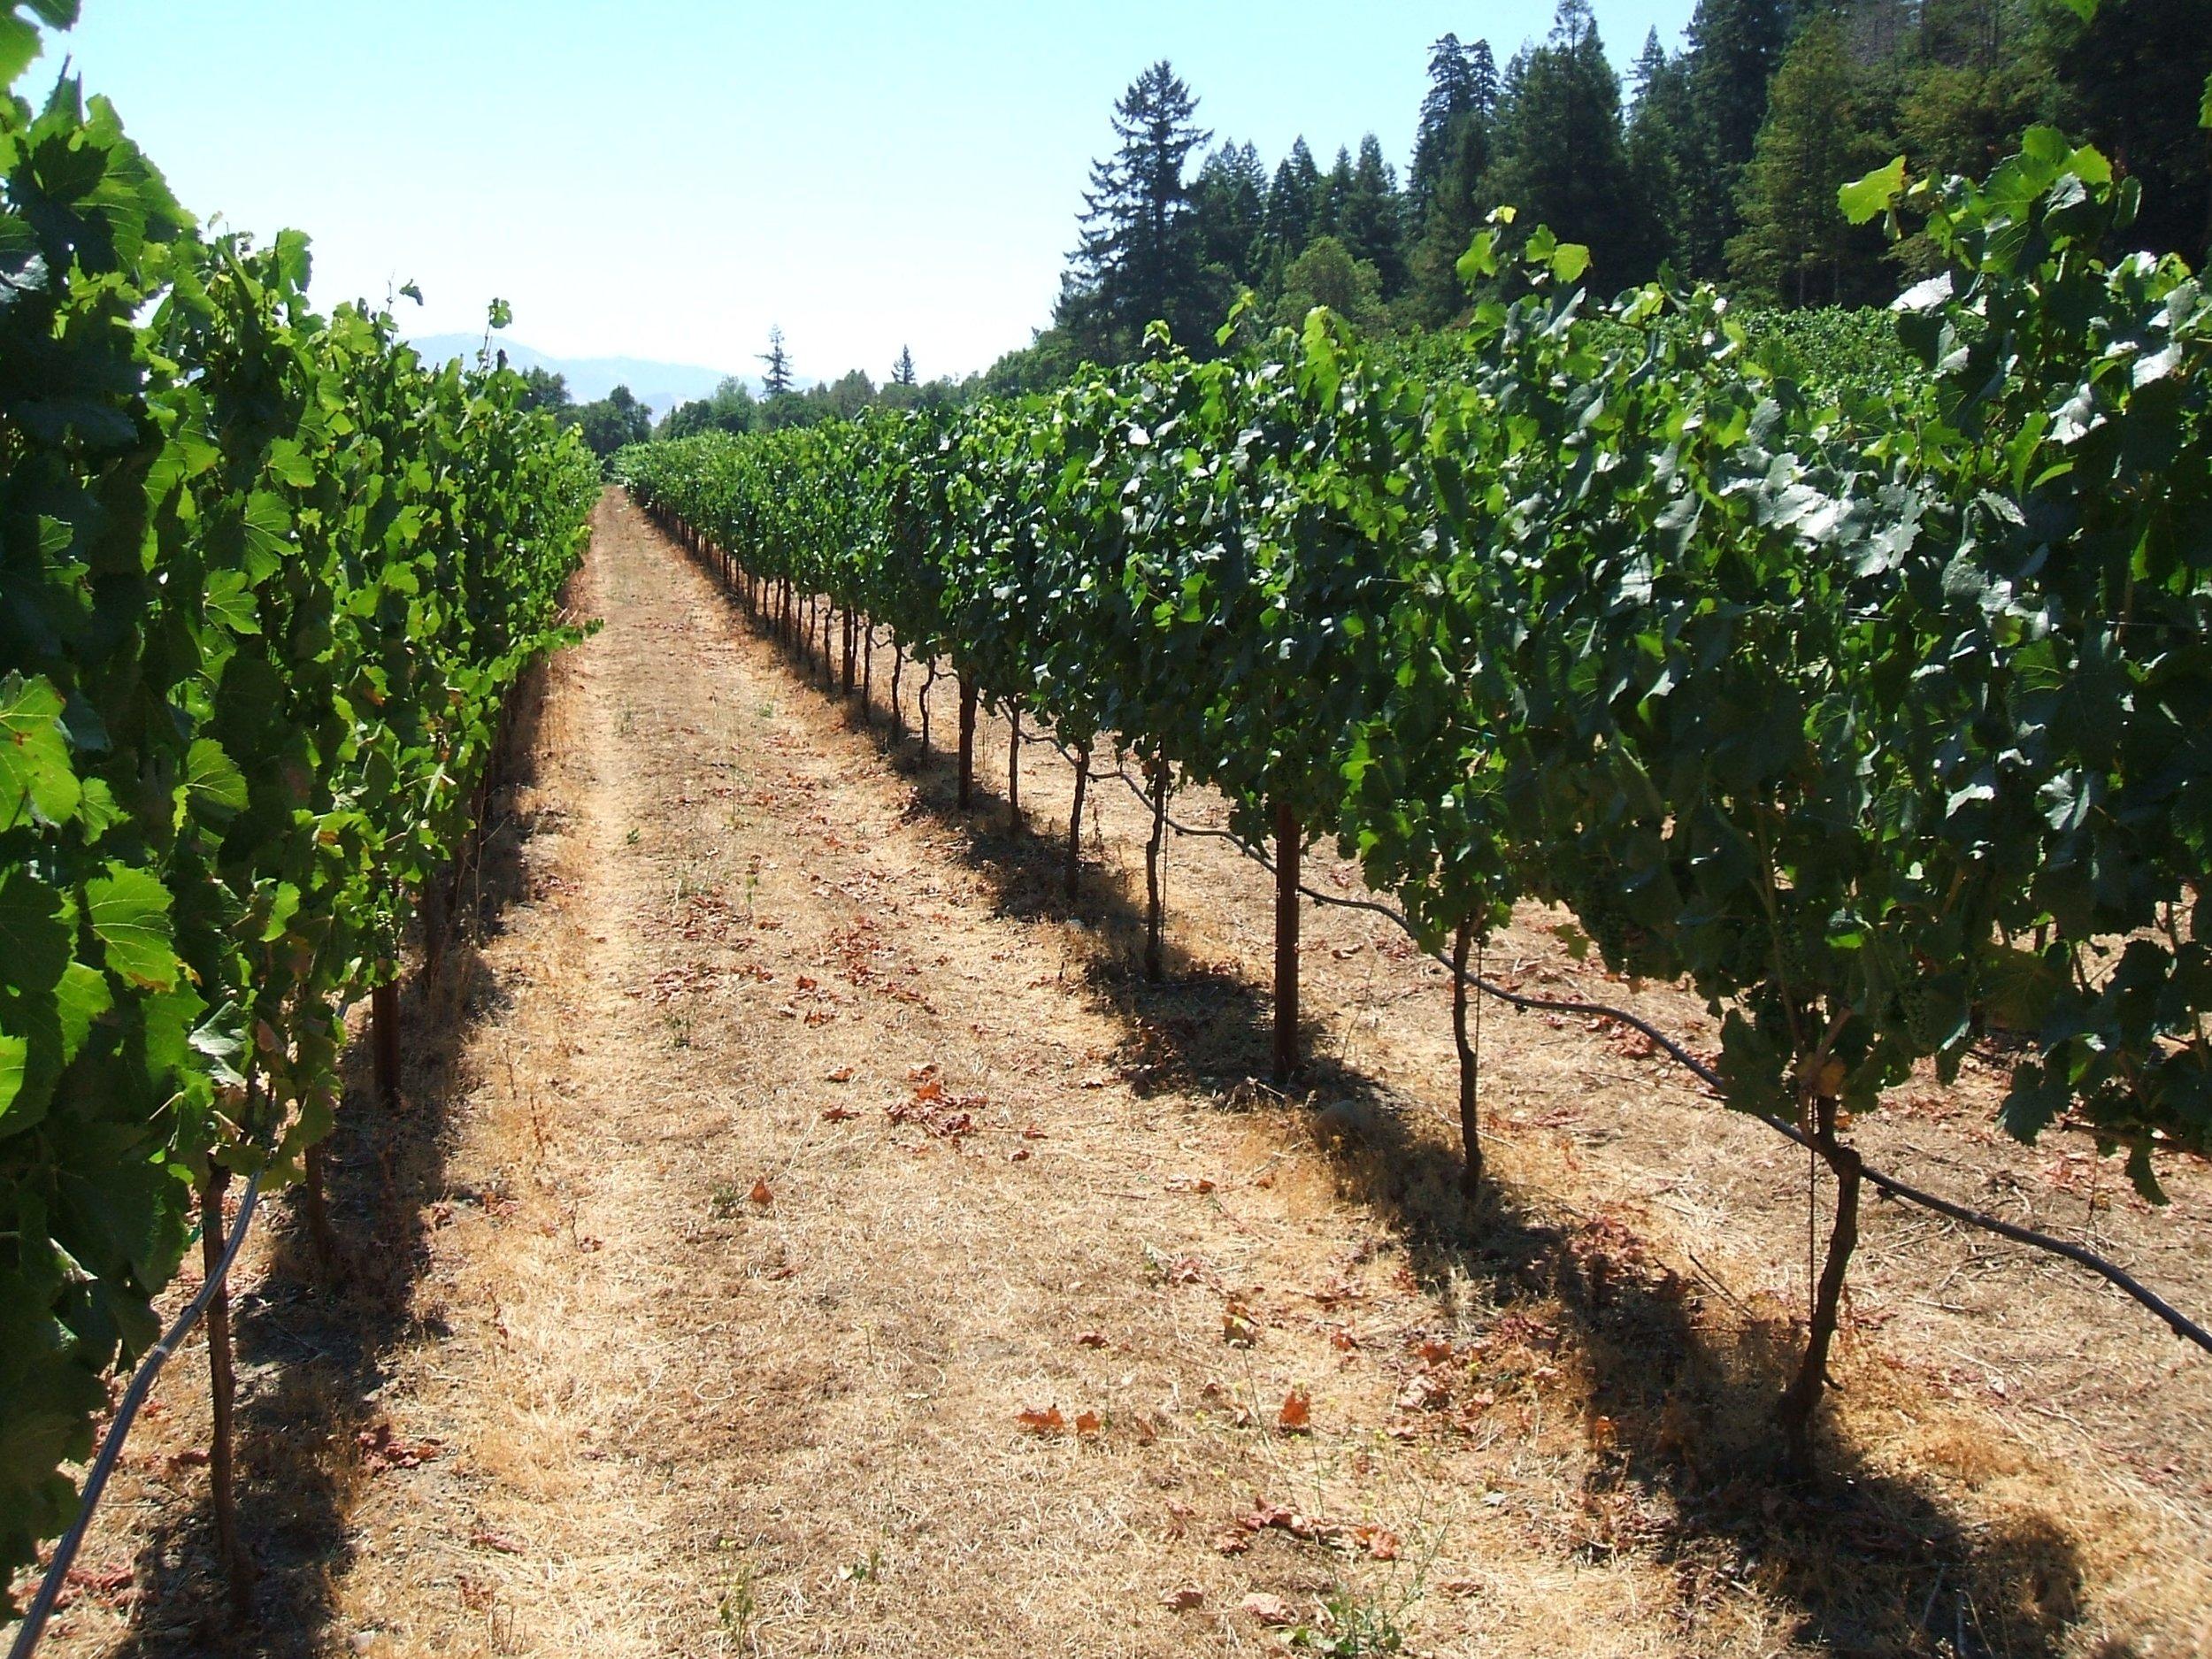 ORDWAY, DEEP END FARMS - Pinot Noir